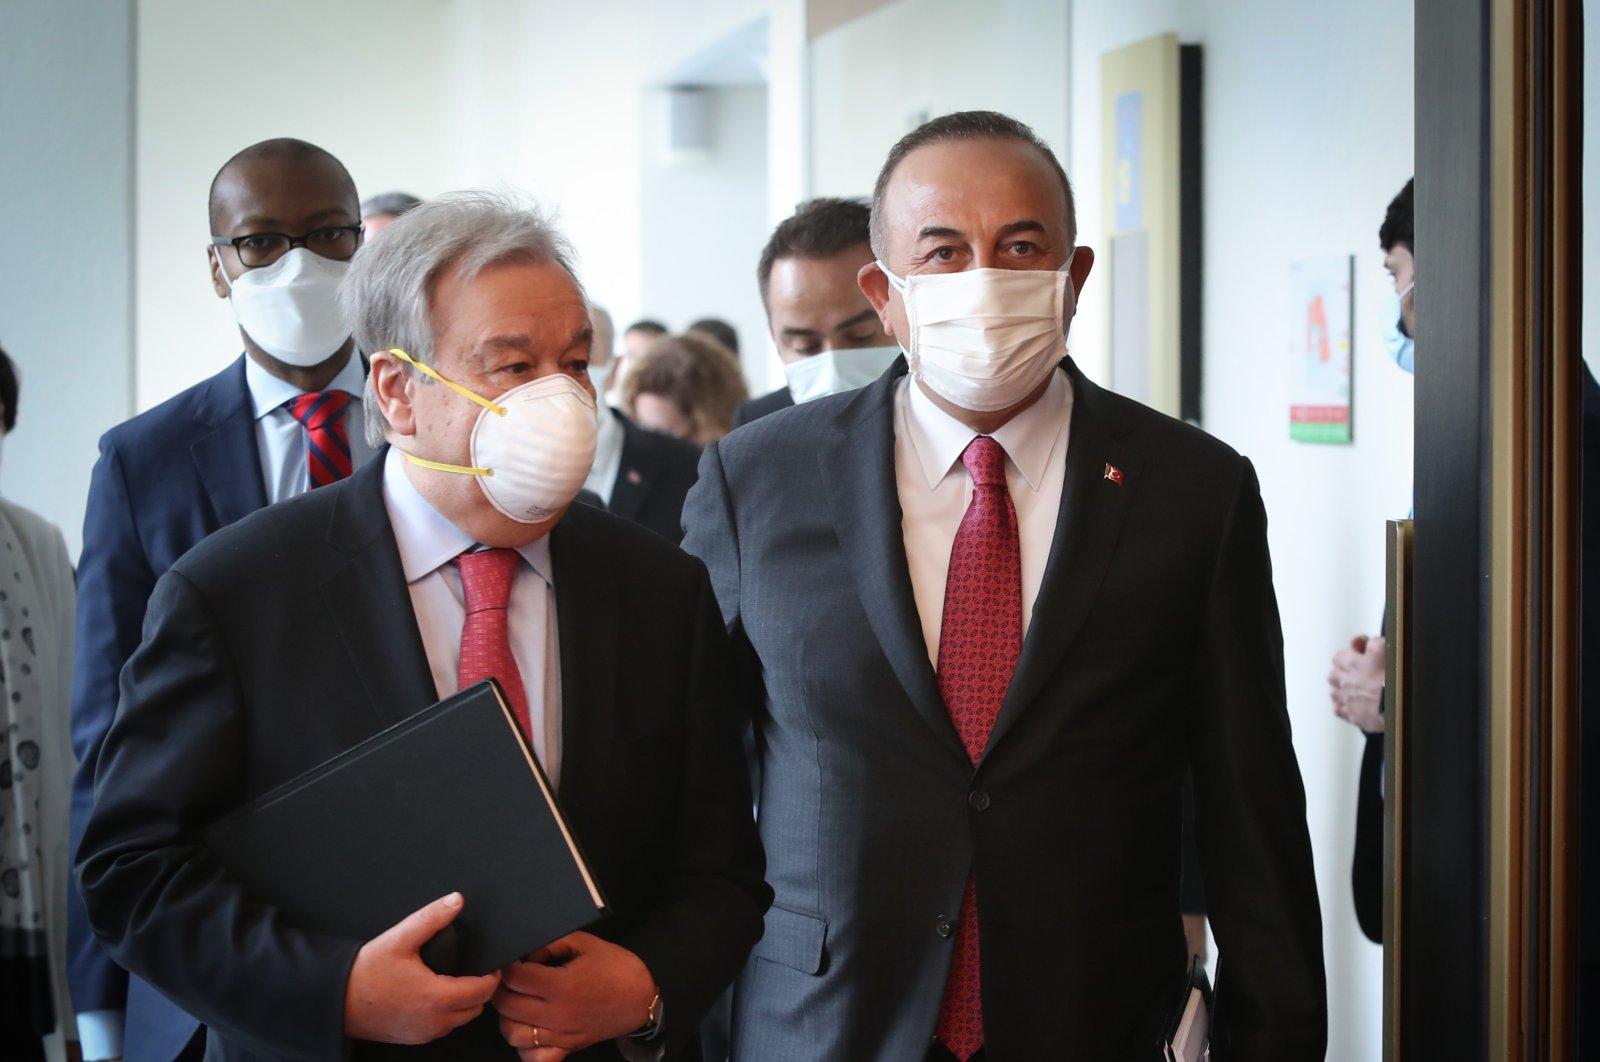 U.N. Secretary-General Antonio Guterres attends the U.N.-led Cyprus talks in Geneva, Switzerland, April 28, 2021. (AA Photo)